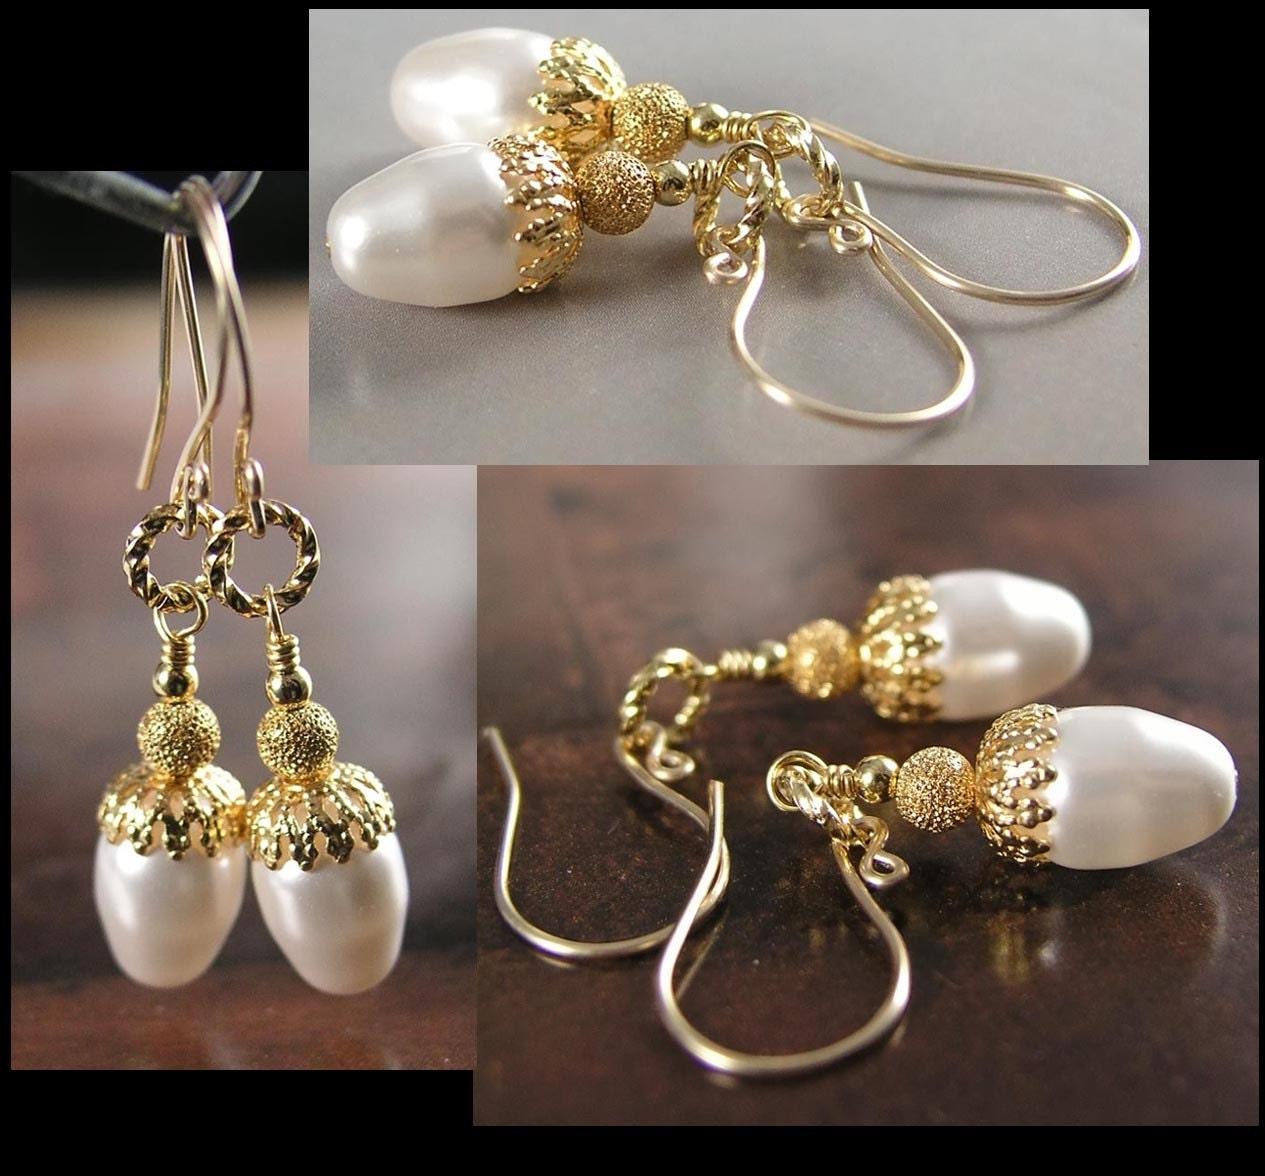 FAIRYLAND ACORNS Earrings, Swarovski White Crystal Pearls,  Gold